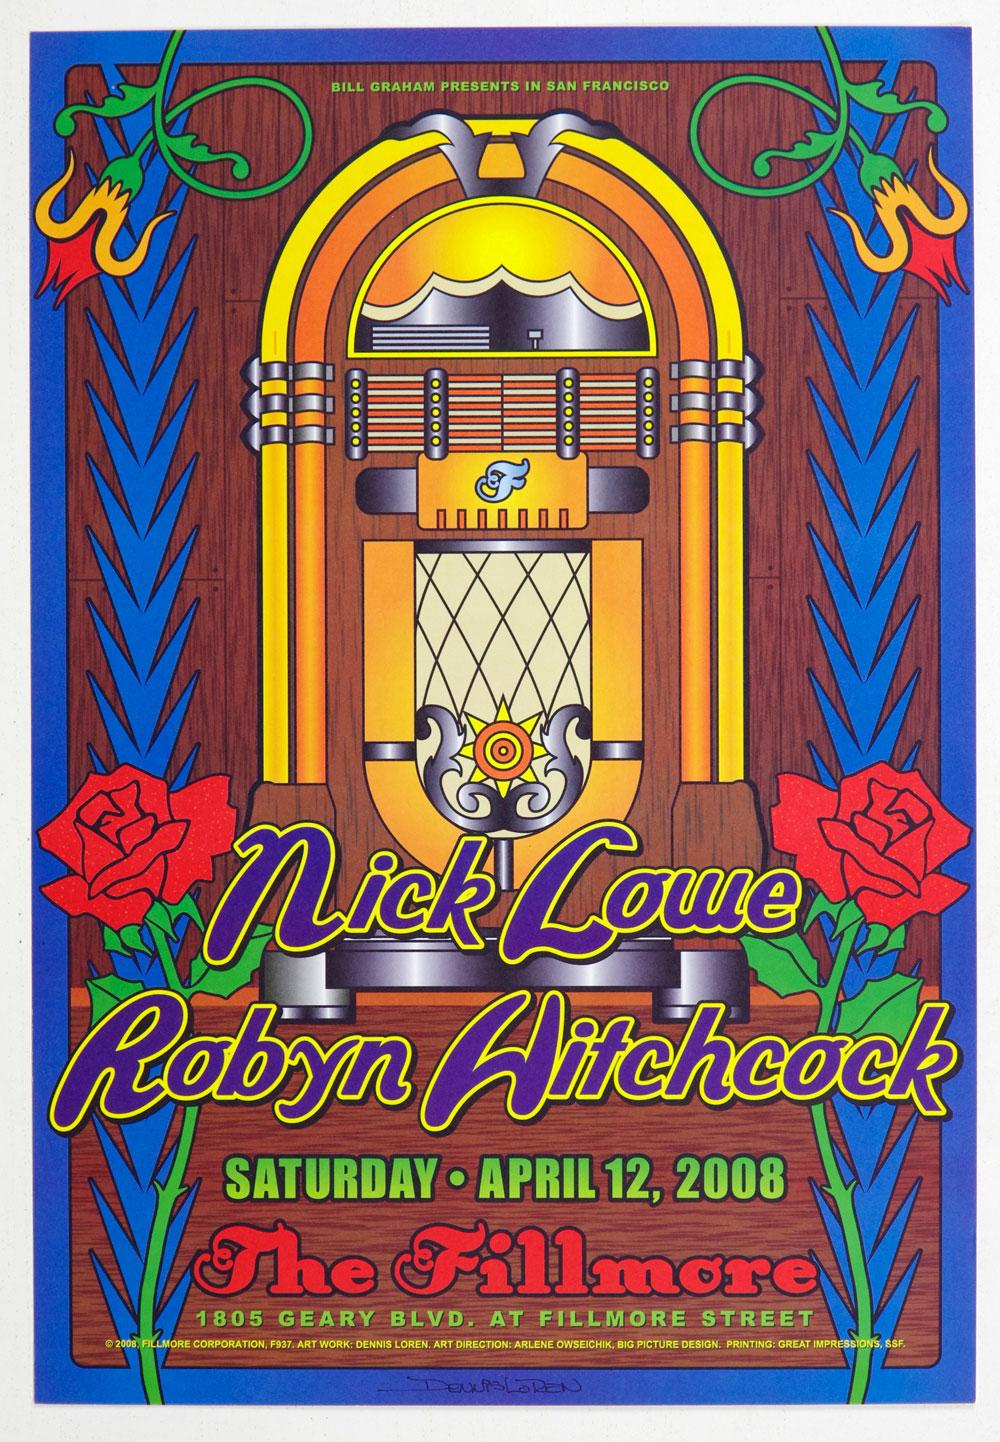 Nick Lowe Poster 2008 Apr 12 New Fillmore Dennis Loren Signed